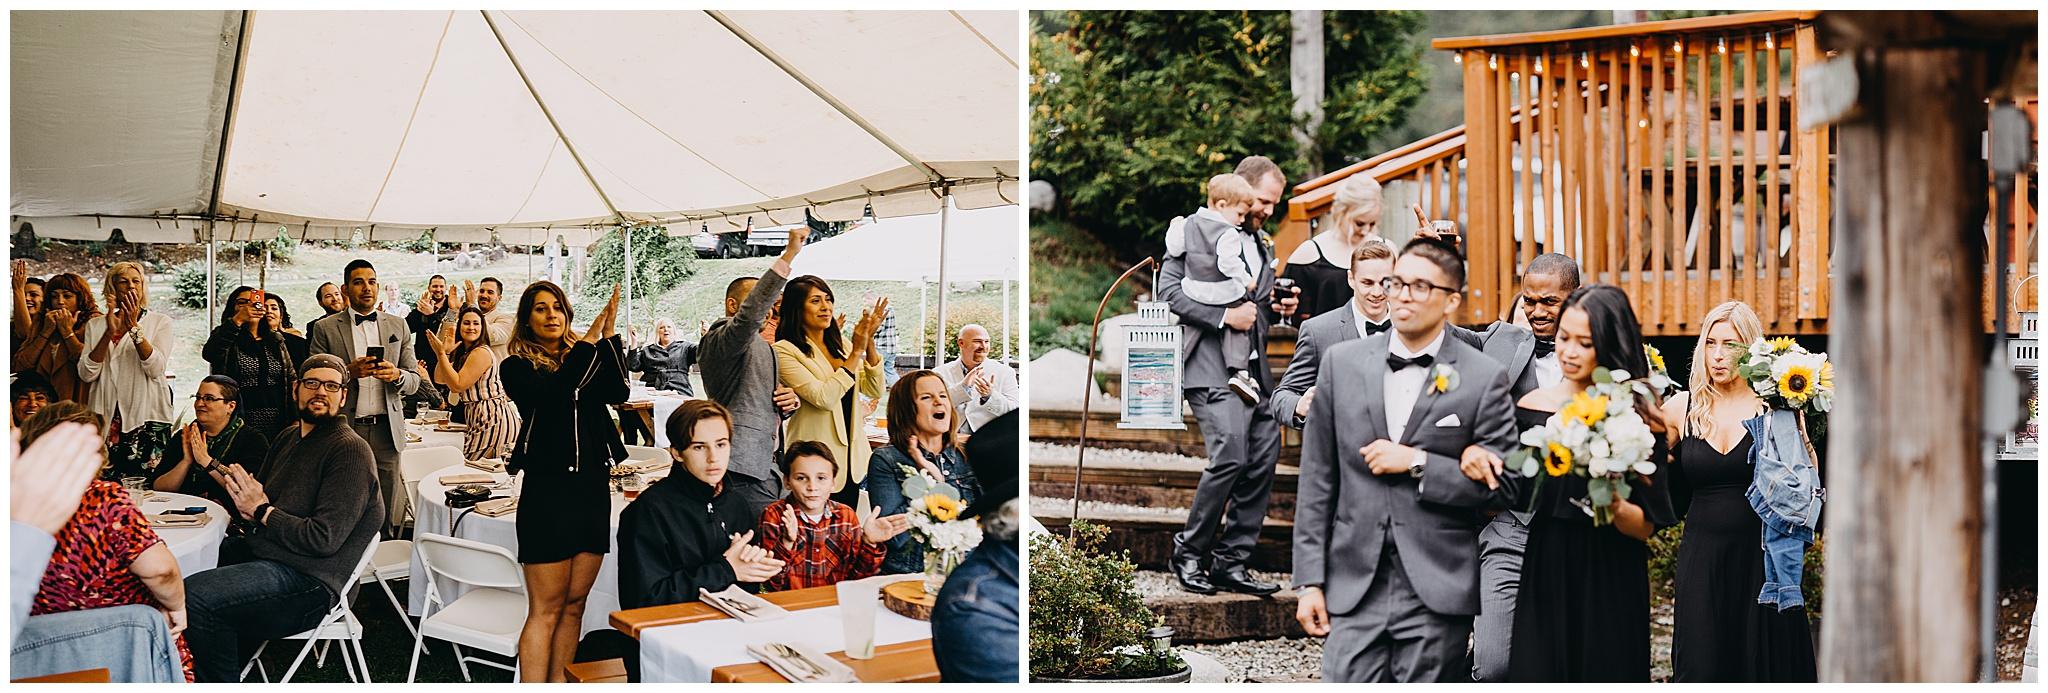 index-wa-wedding61.jpg